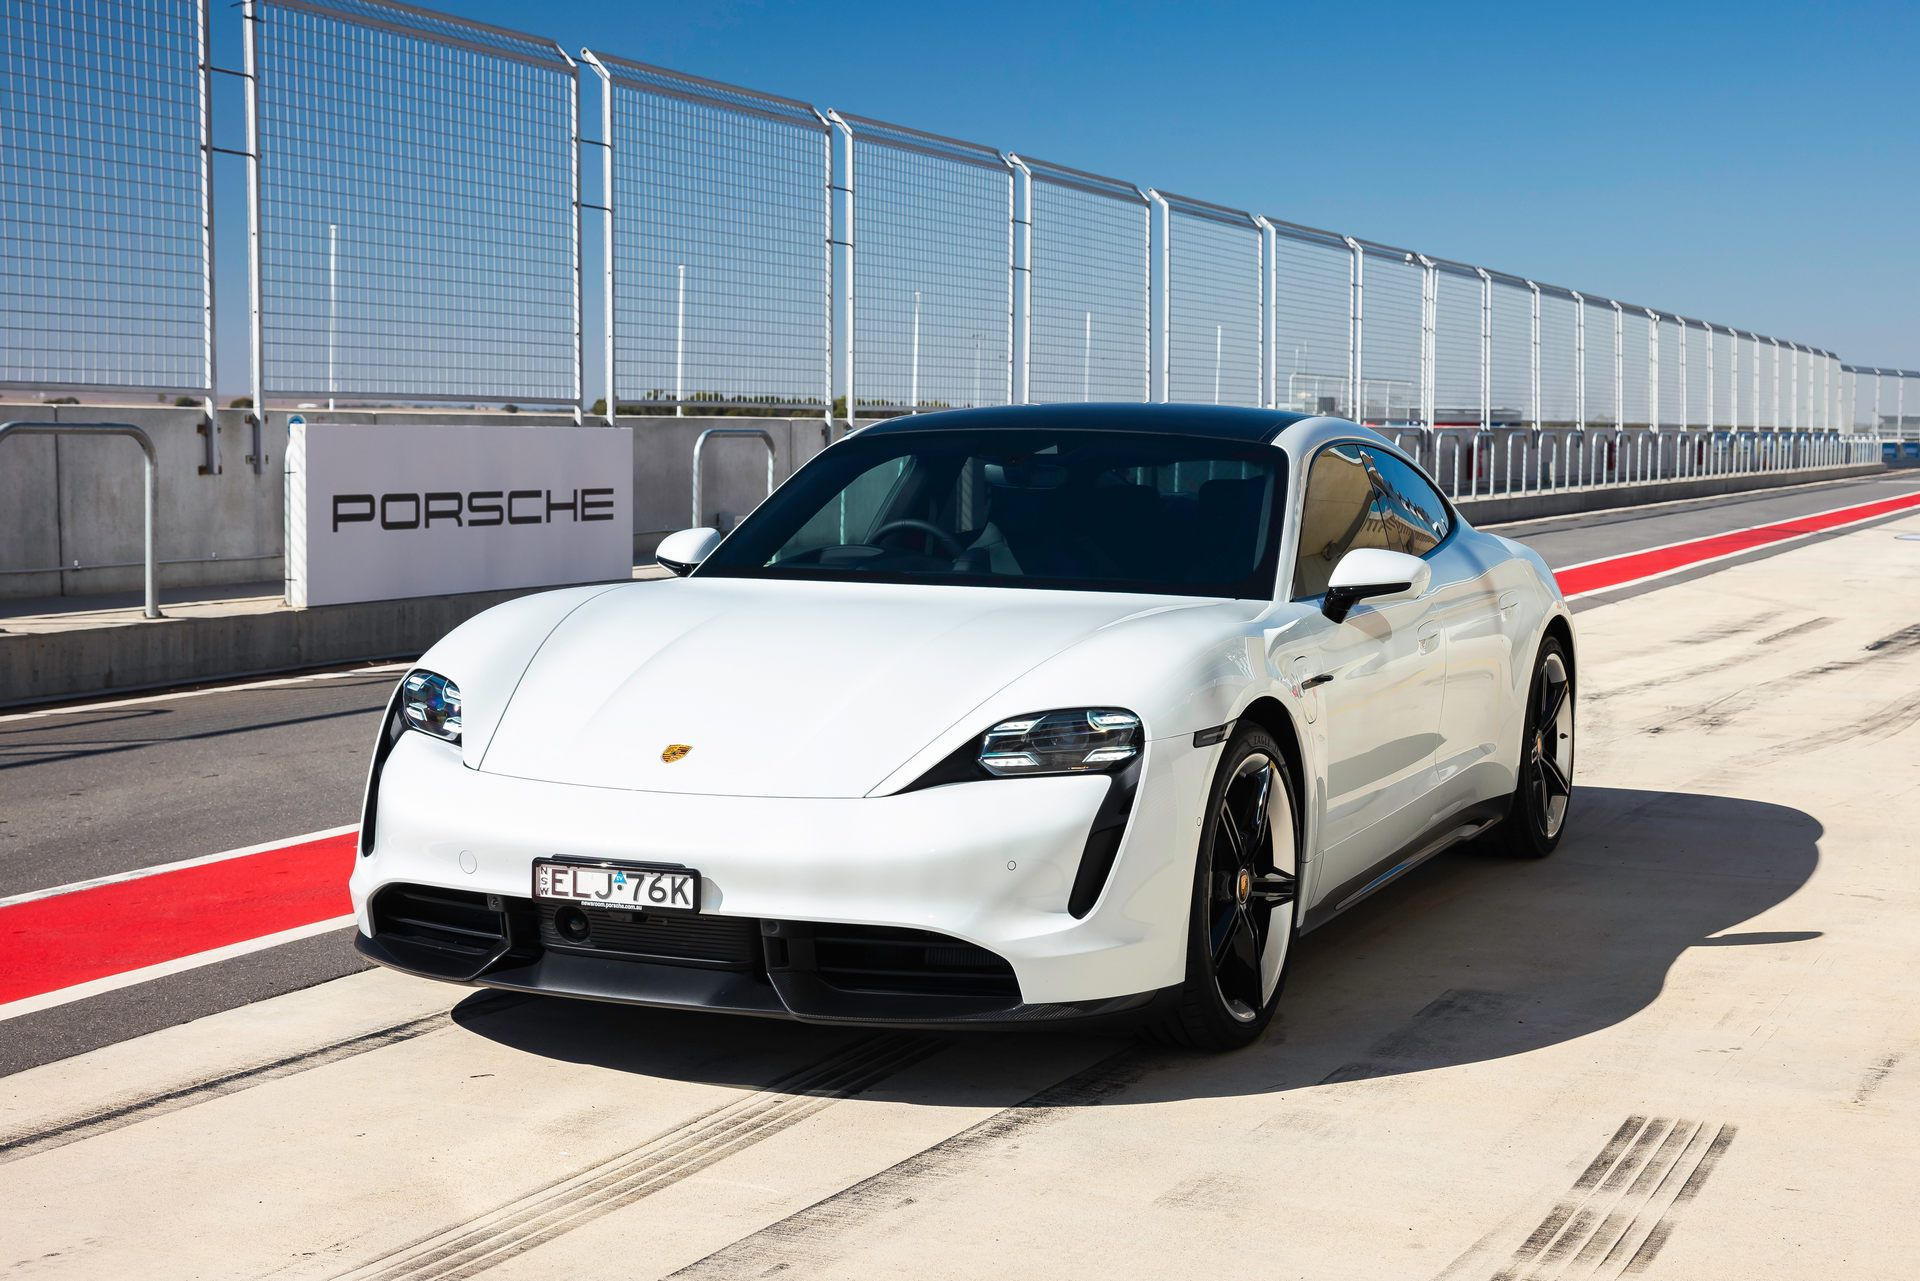 Porsche-Taycan-Turbo-S-The-Bend-Motorsport-Park-36